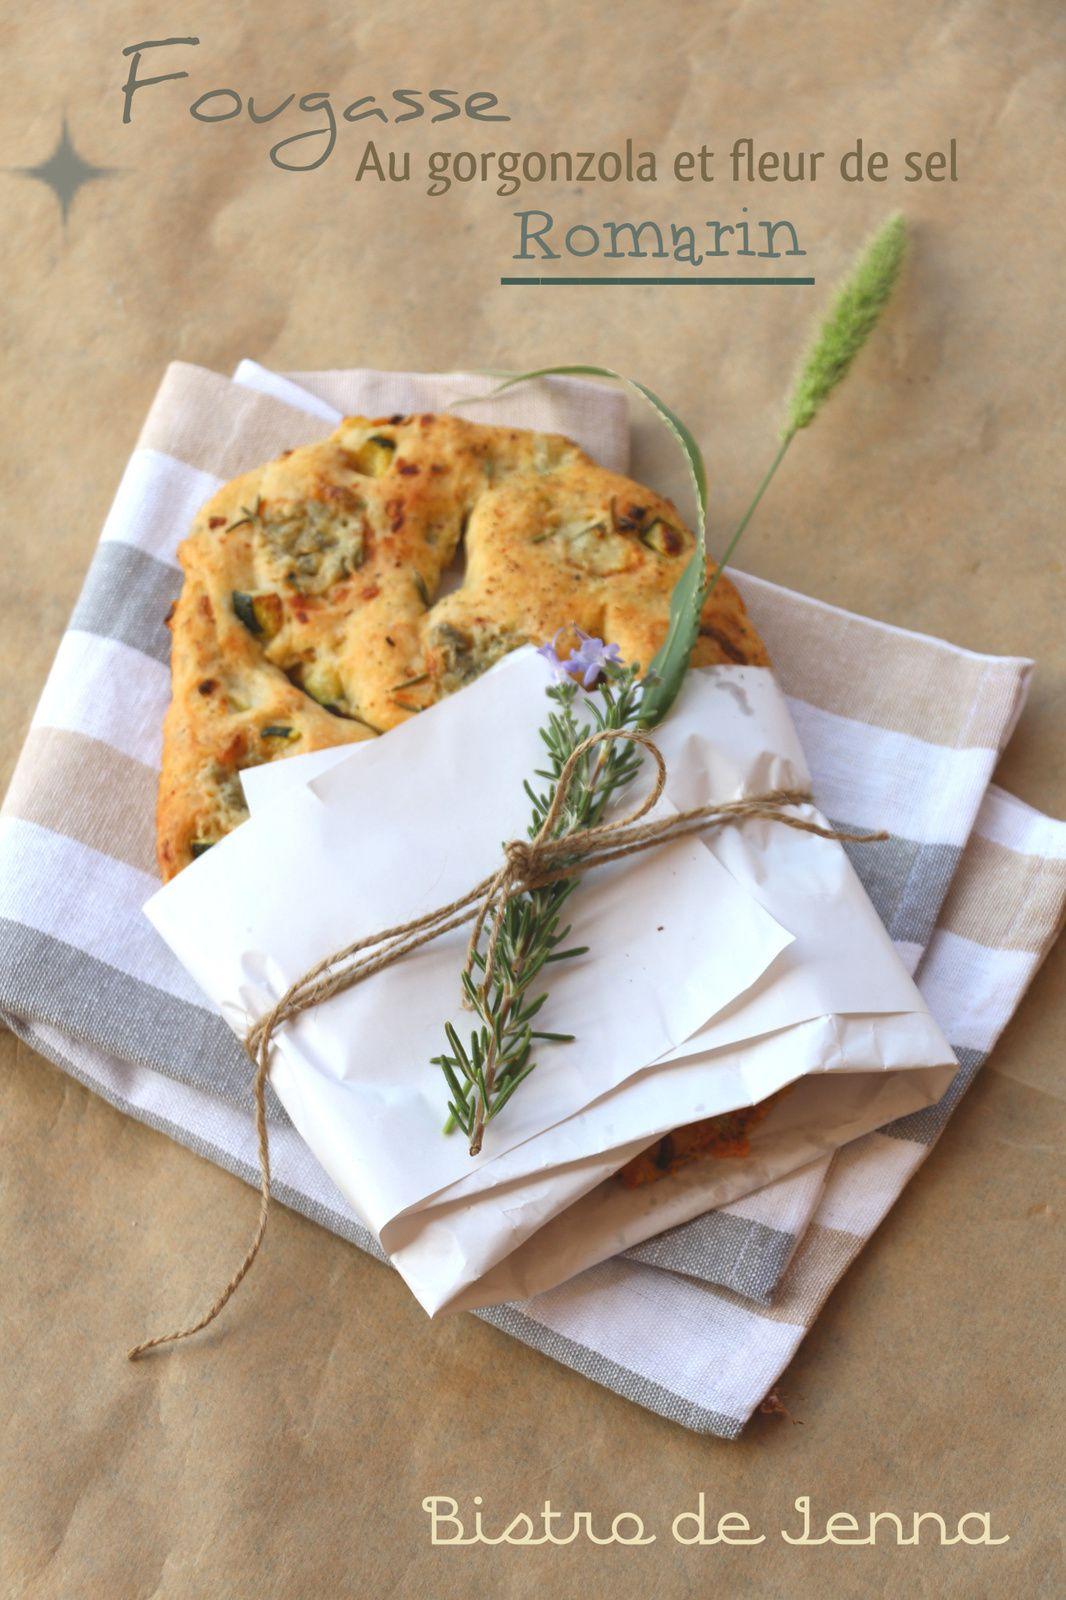 Fougasse au gorgonzola, romarin et fleur de sel